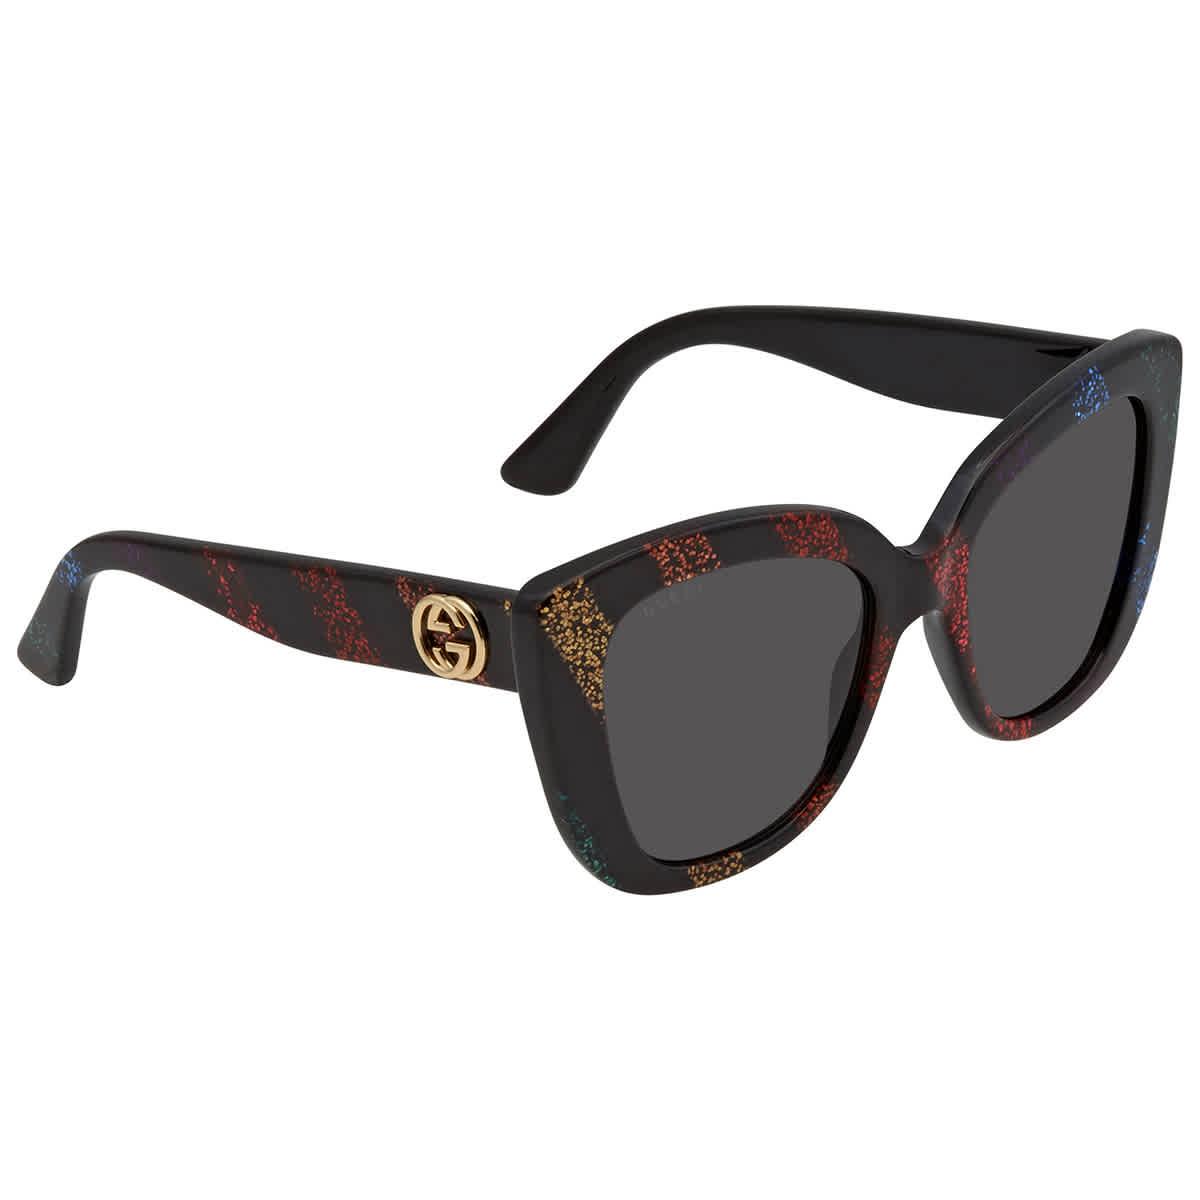 Gucci Grey Cat Eye Ladies Sunglasses Gg0327s 003 52